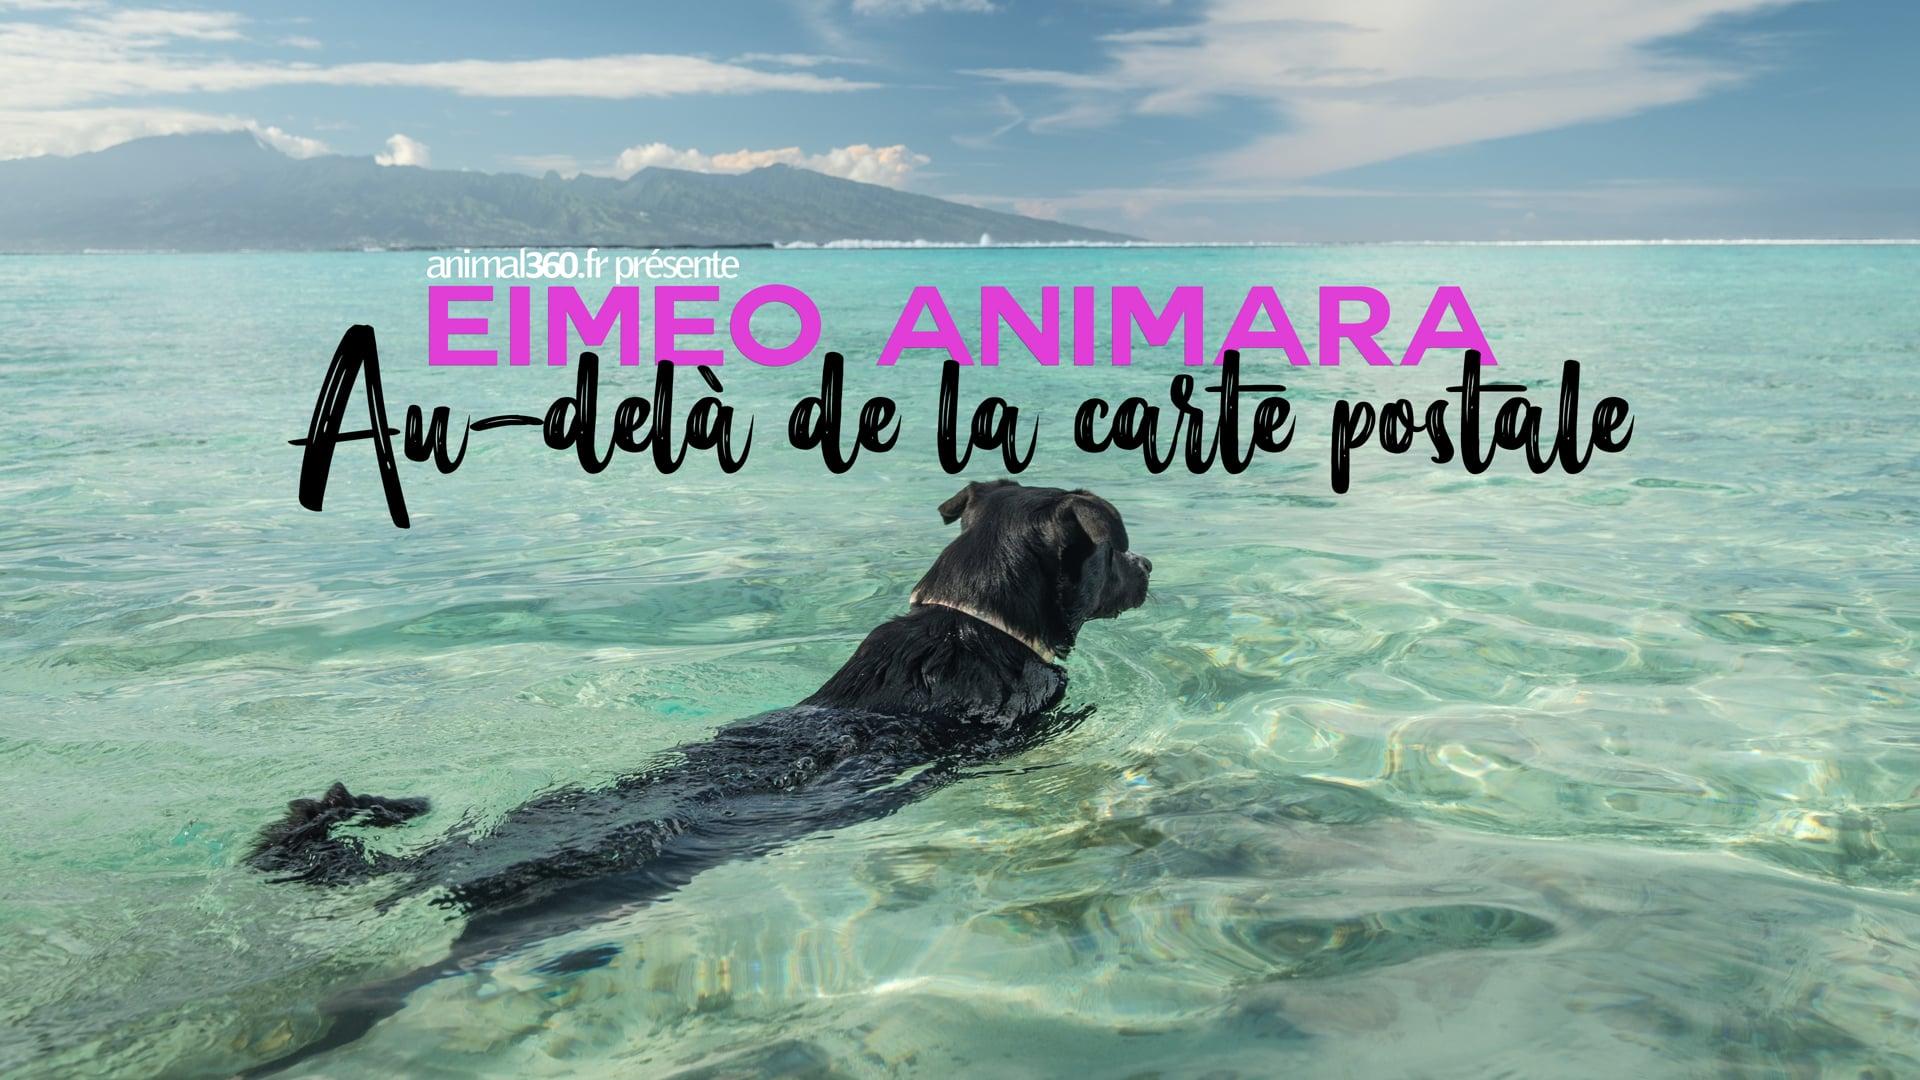 Eimeo Animara, beyond the postcard